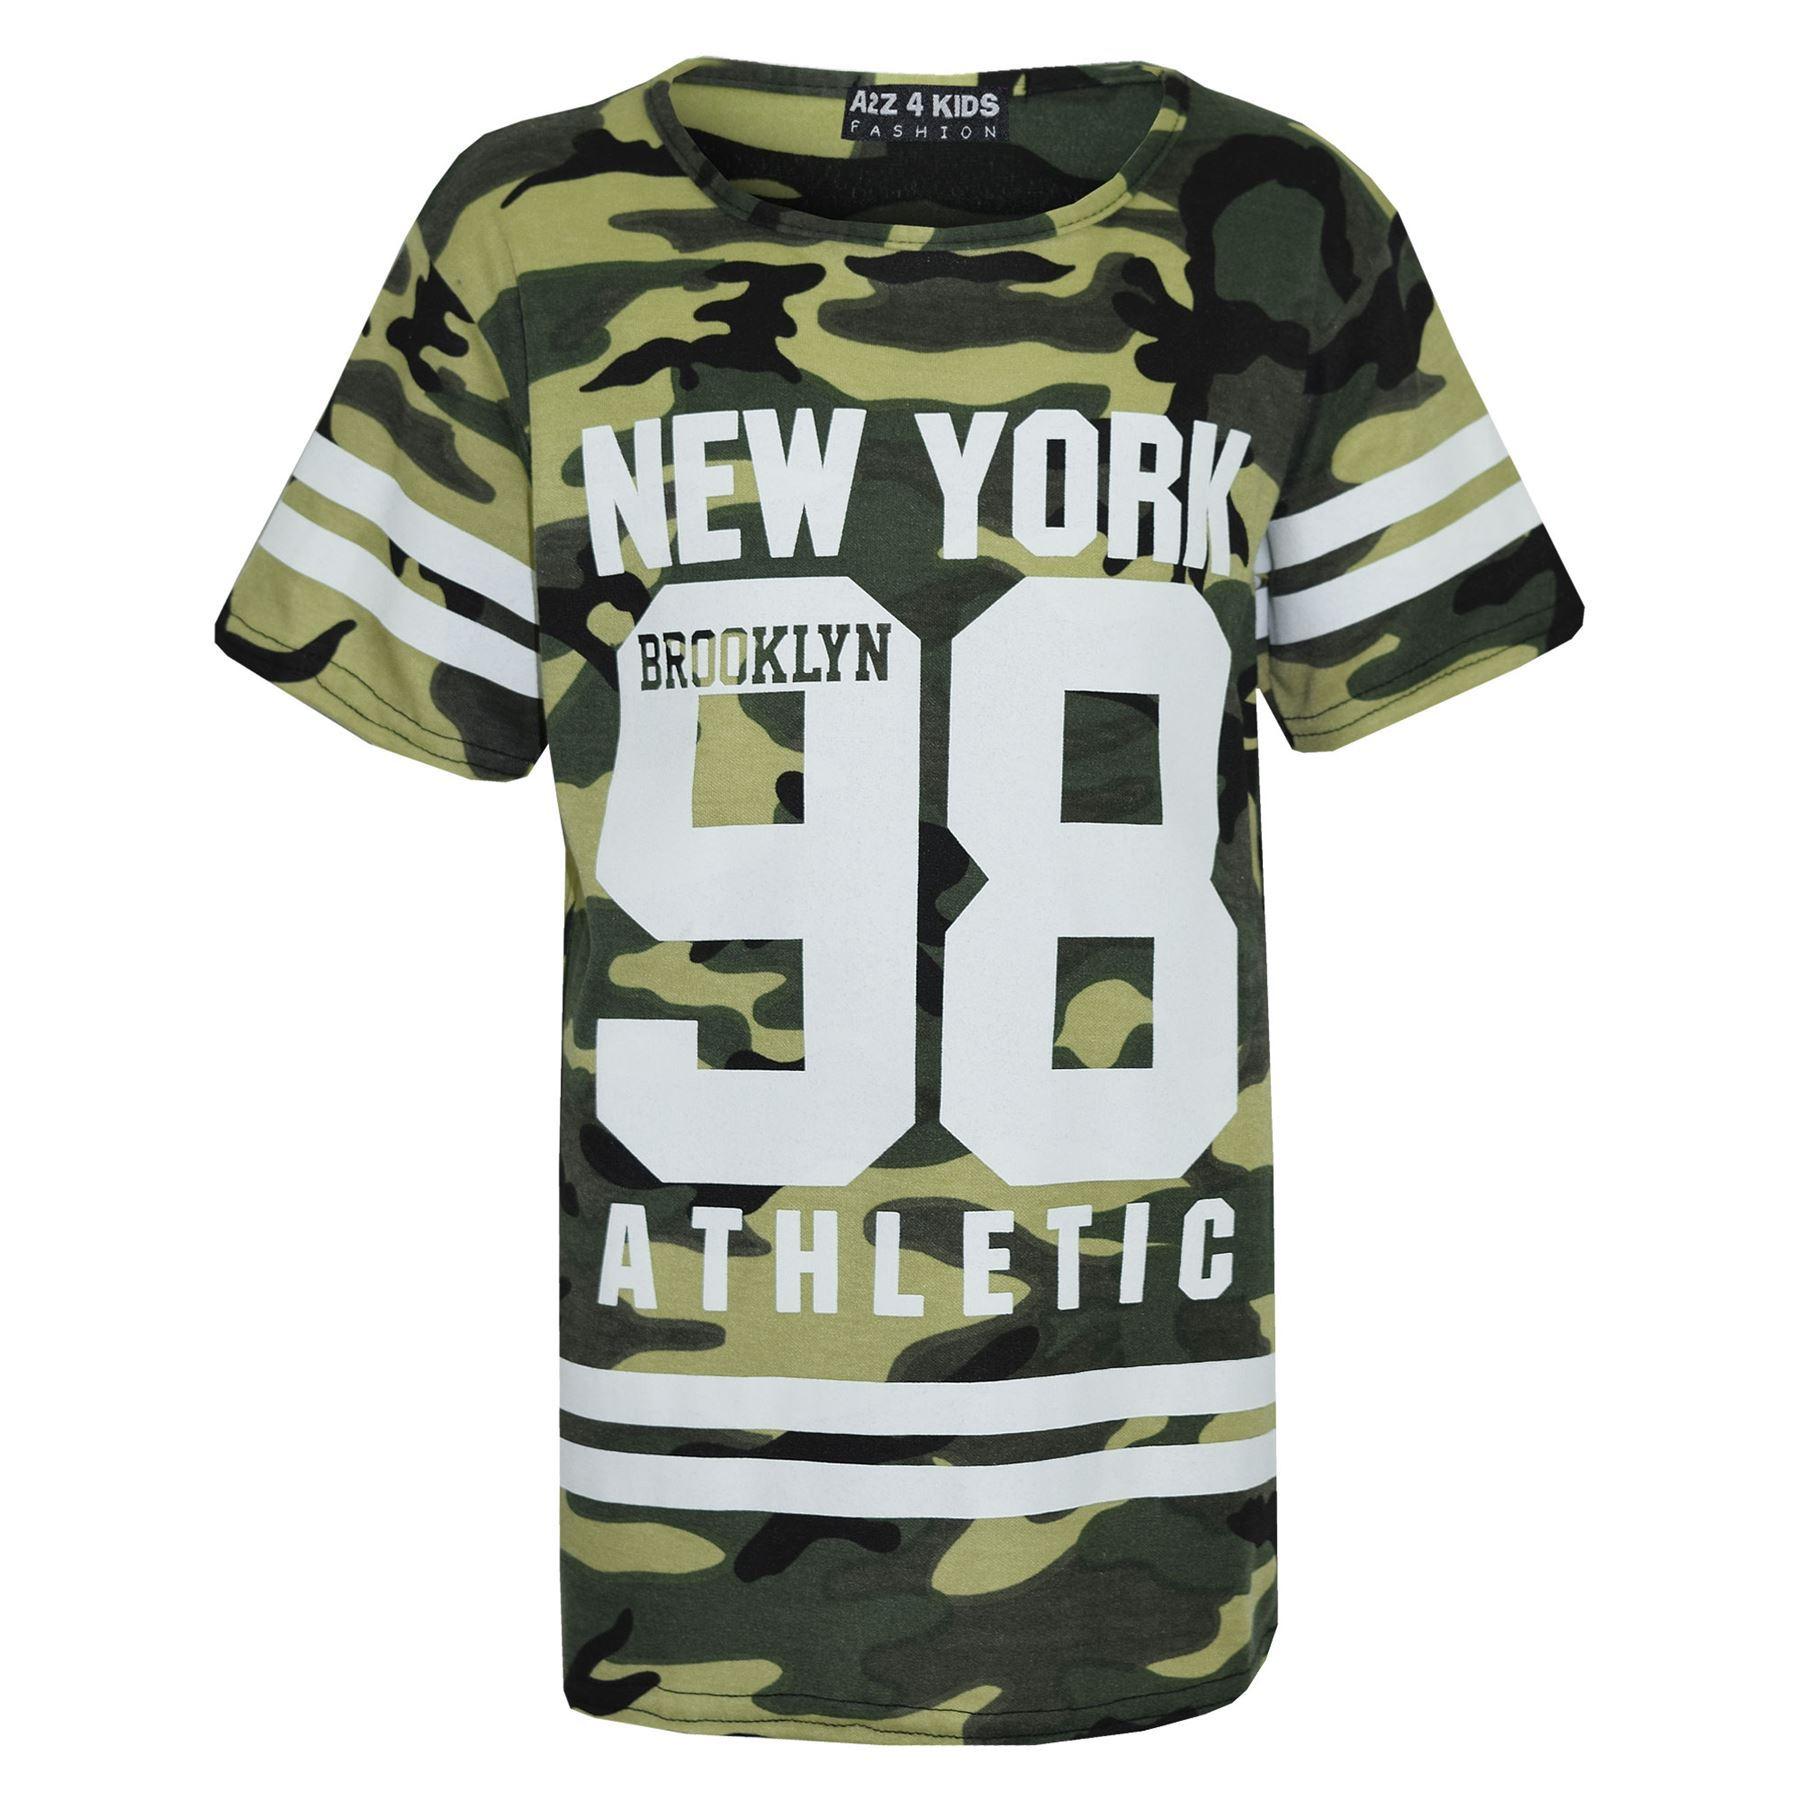 Girls-NEW-YORK-BROOKLYN-98-ATHLECTIC-Camouflage-Print-Top-amp-Legging-Set-7-13-Yr thumbnail 23